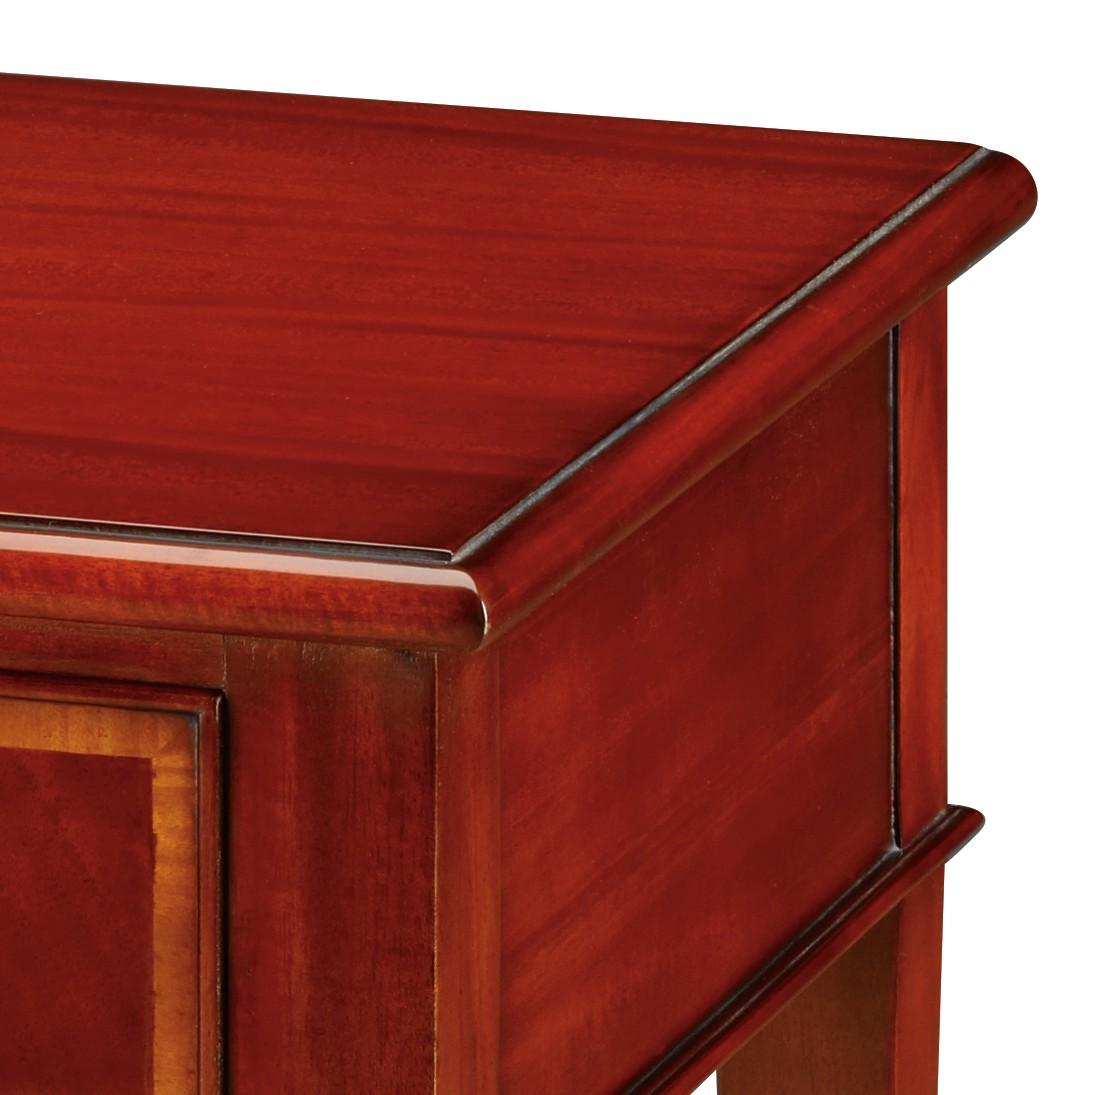 Beistelltisch Holz Mahagoni ~ Größe (b h t) 40 60 40 Farbe Braun Material Holz teilmassiv Style